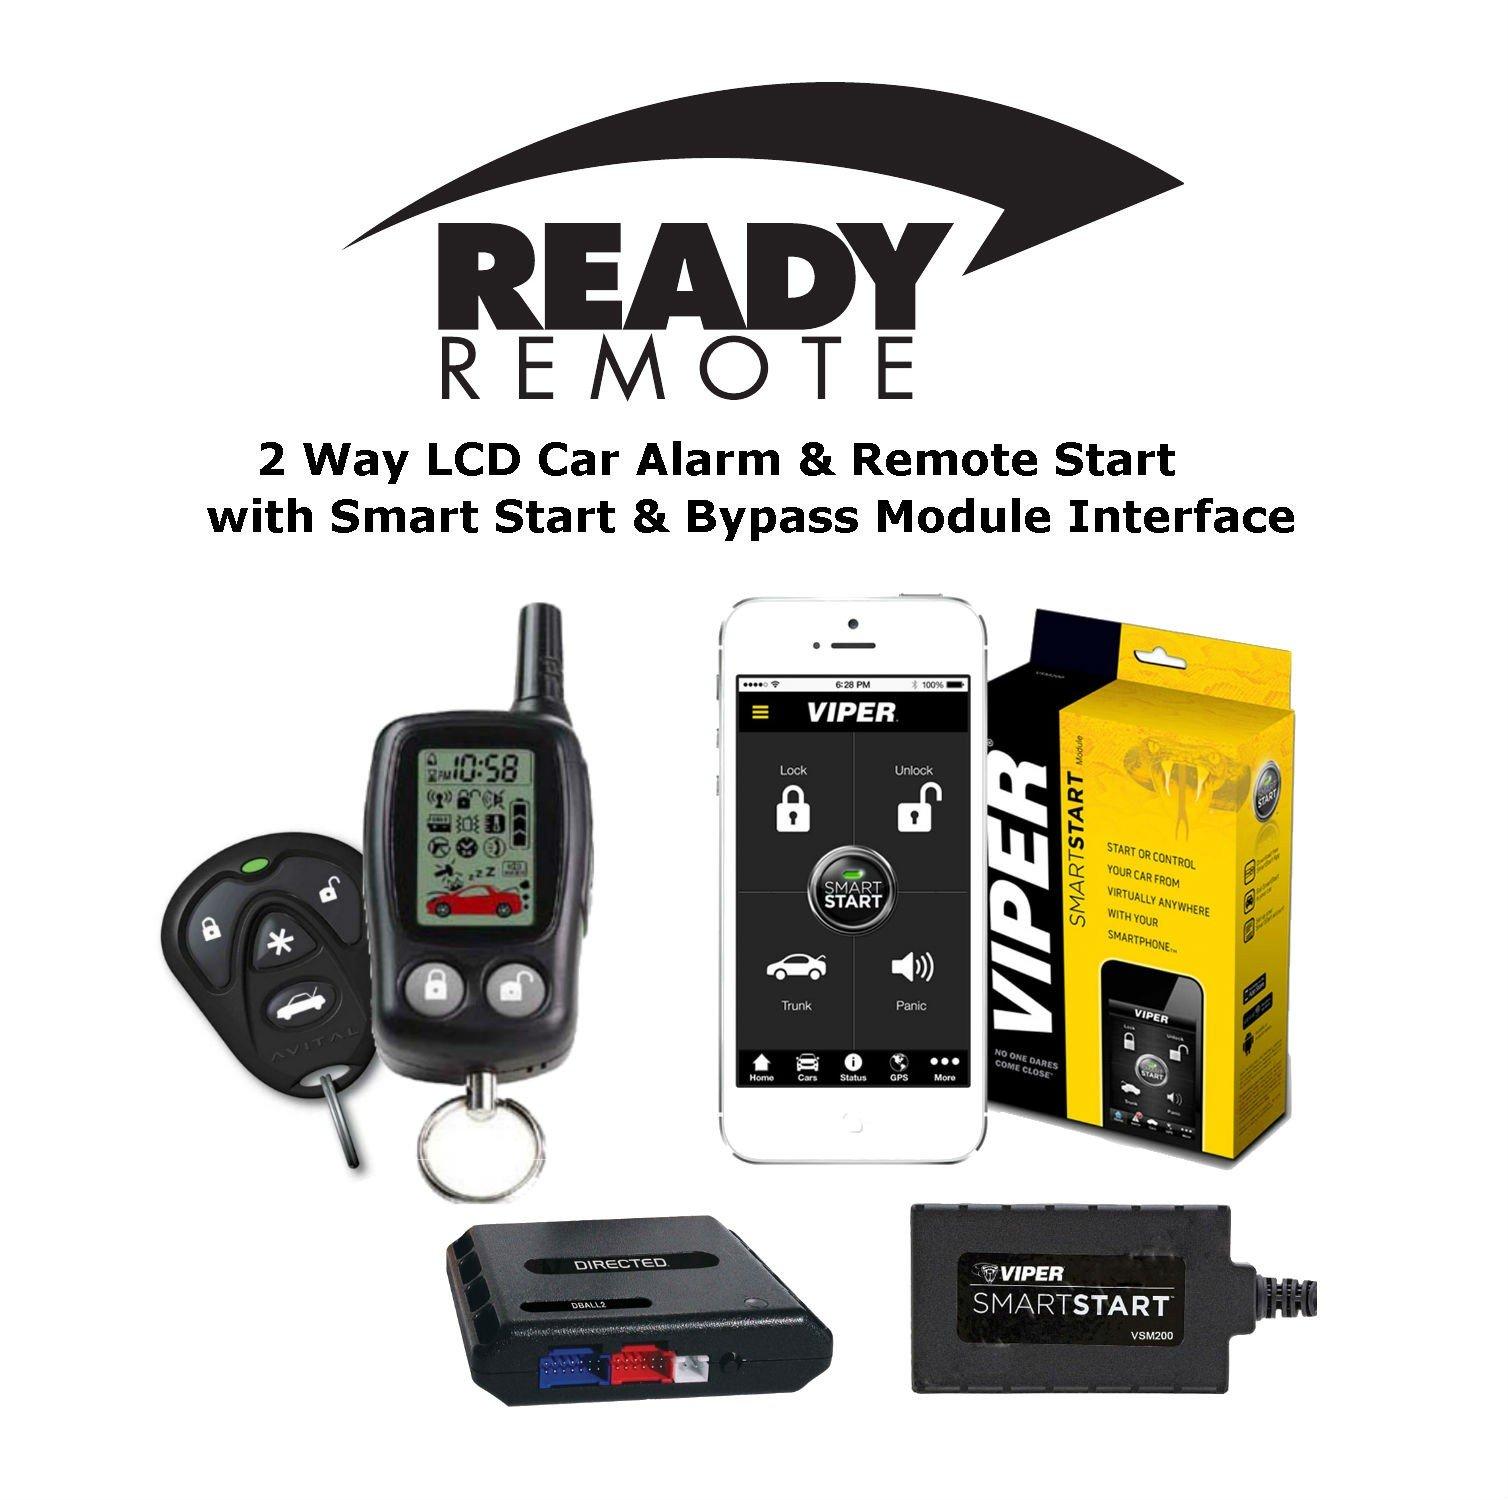 Ready Remote 5303R 2 Way Car Alarm Remote Start Viper VSM200 SmartStart & DBALL2 Bypass Module